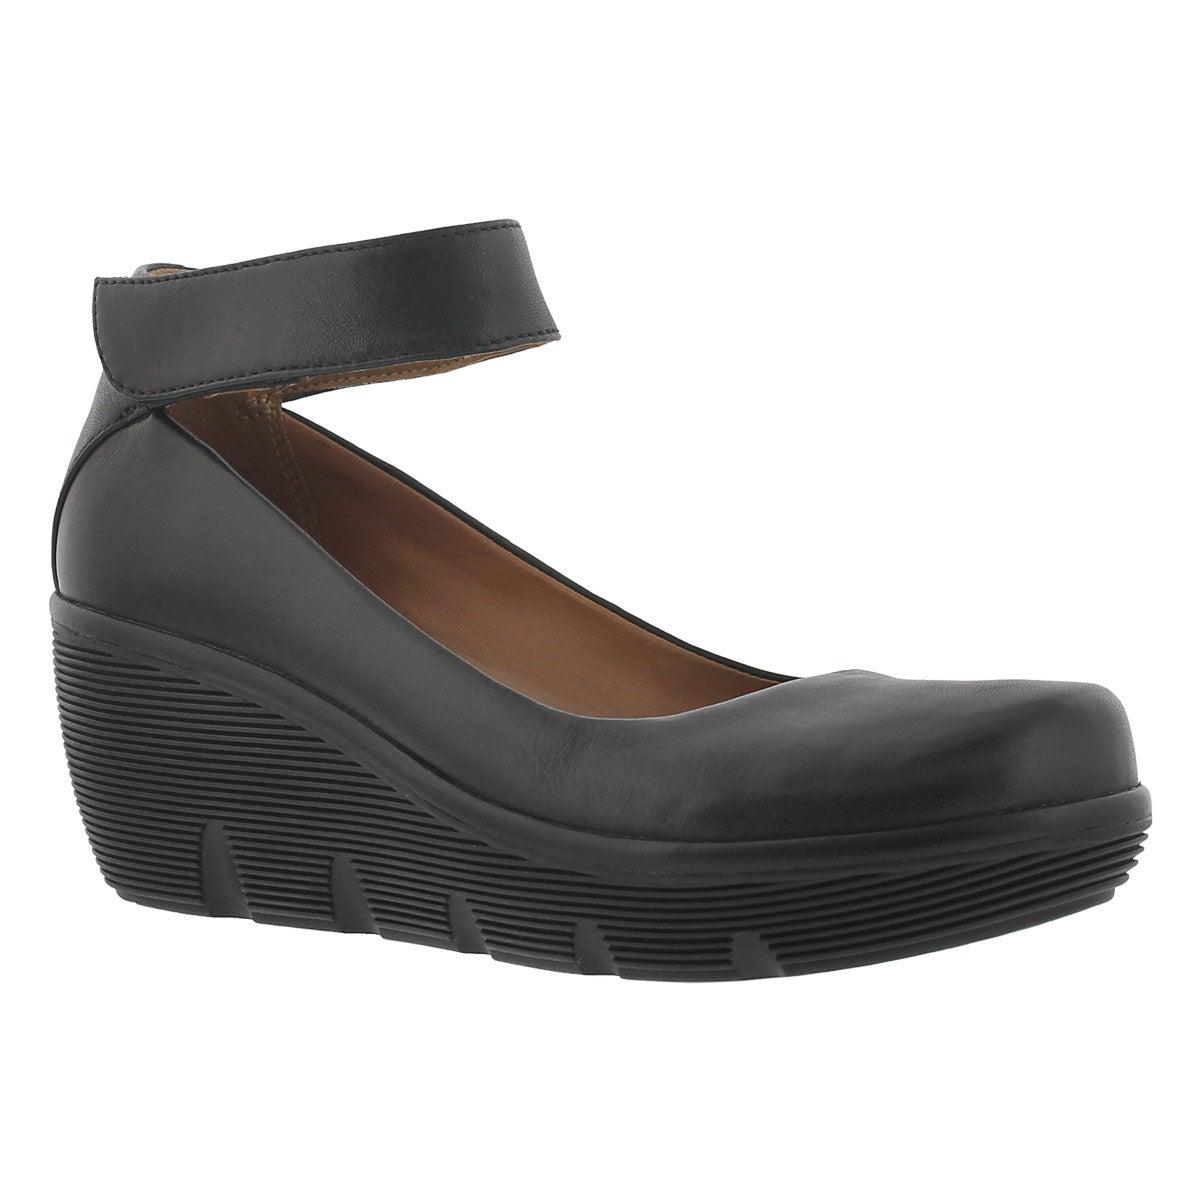 Chaussure Clarene Tide, noir, fem